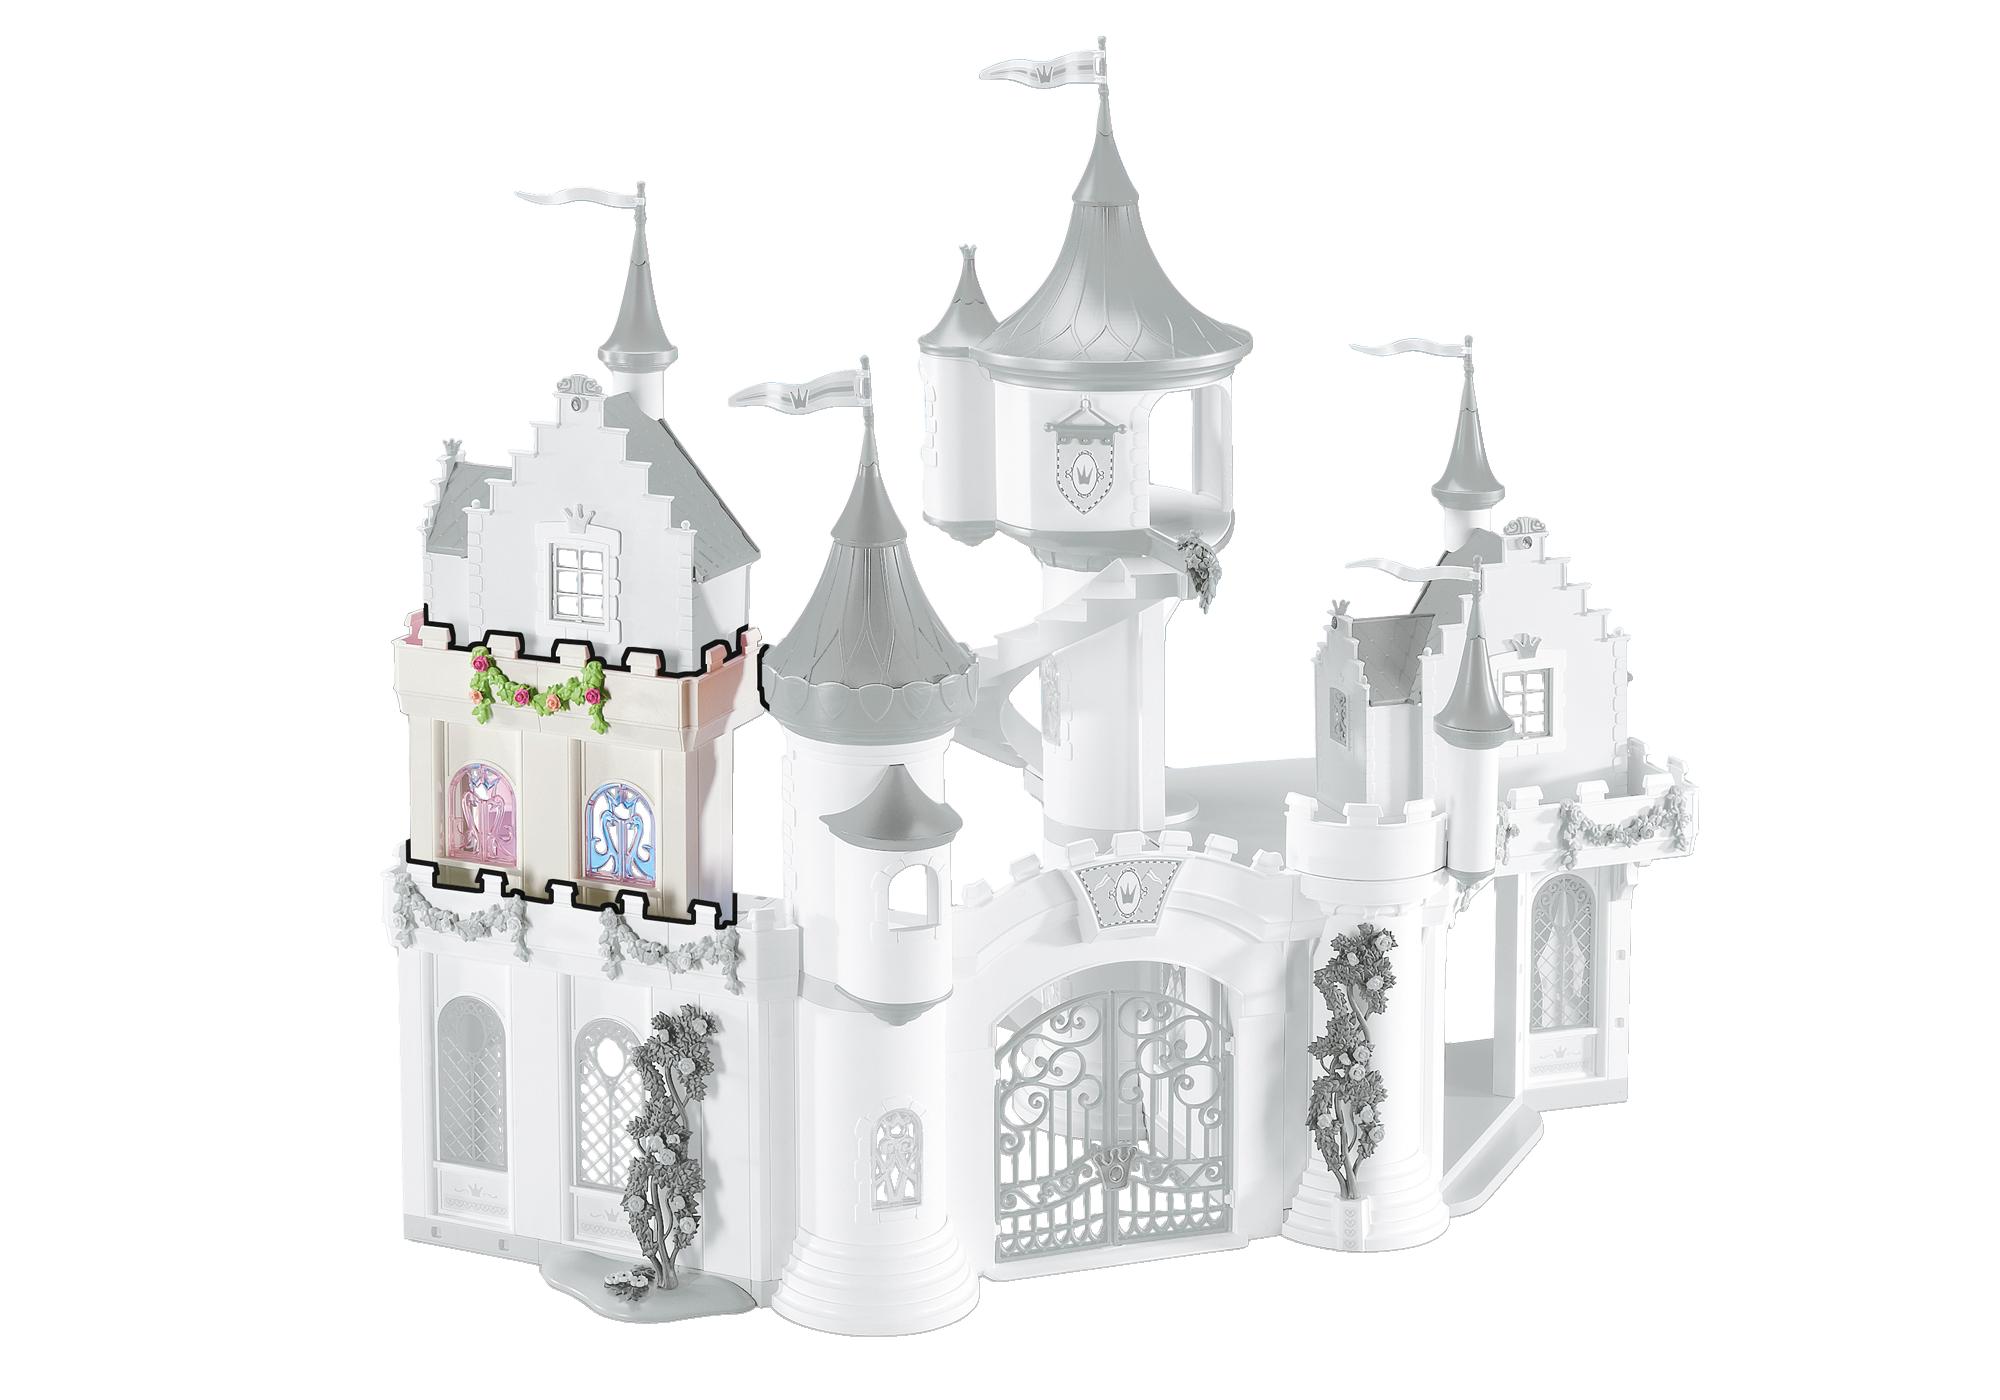 http://media.playmobil.com/i/playmobil/6518_product_detail/Castello della principessa estensione A